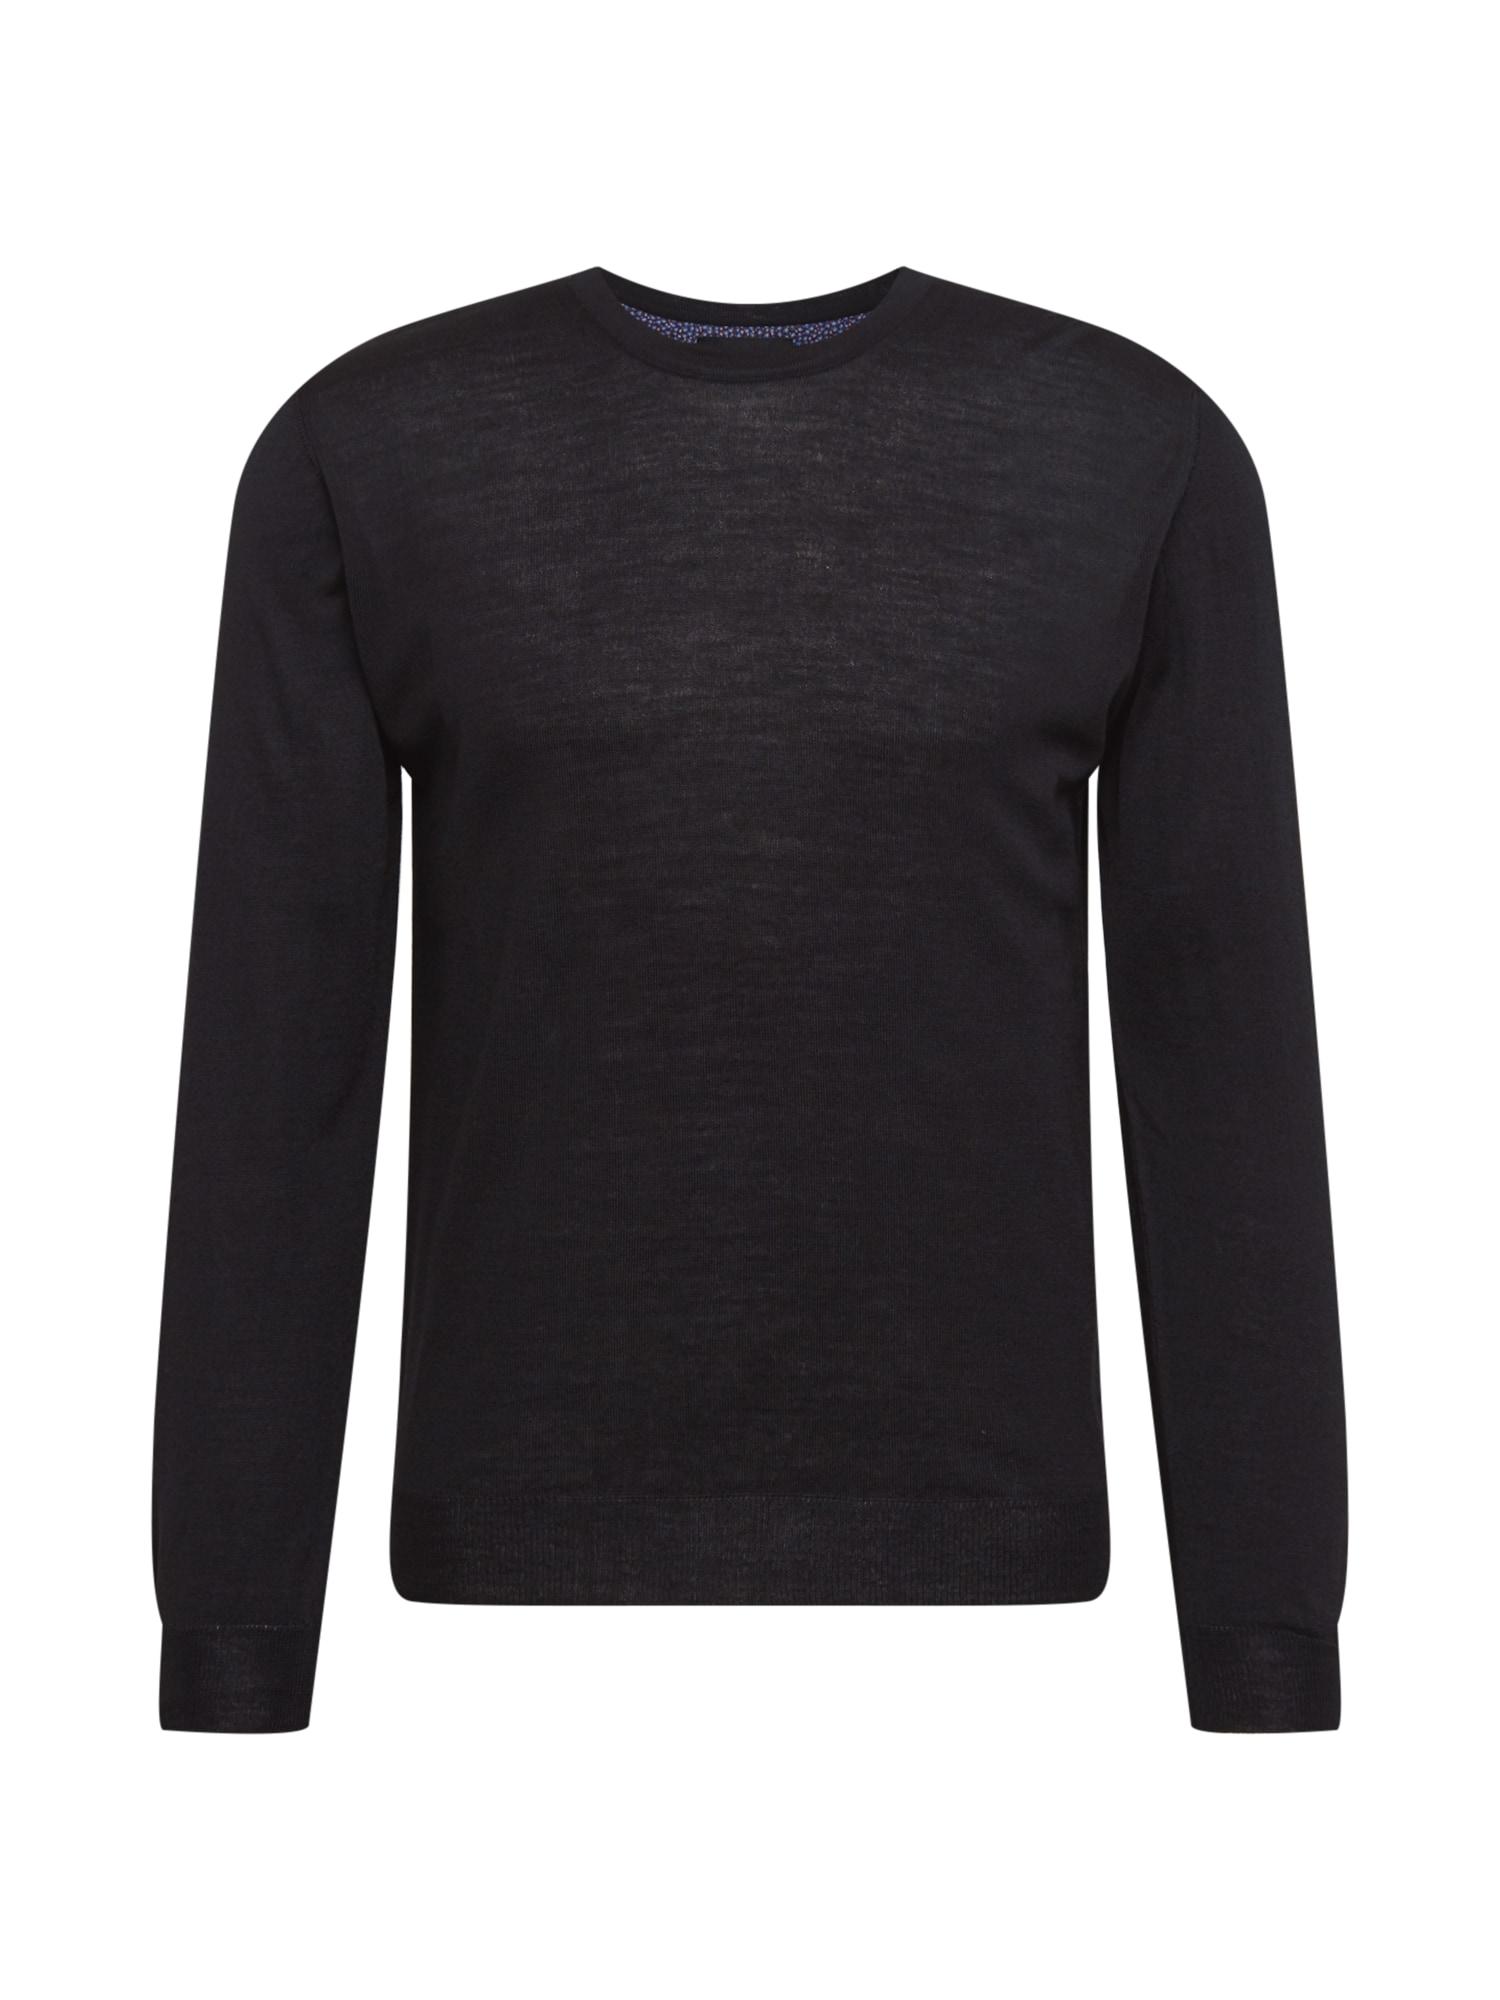 SAND COPENHAGEN Megztinis juoda